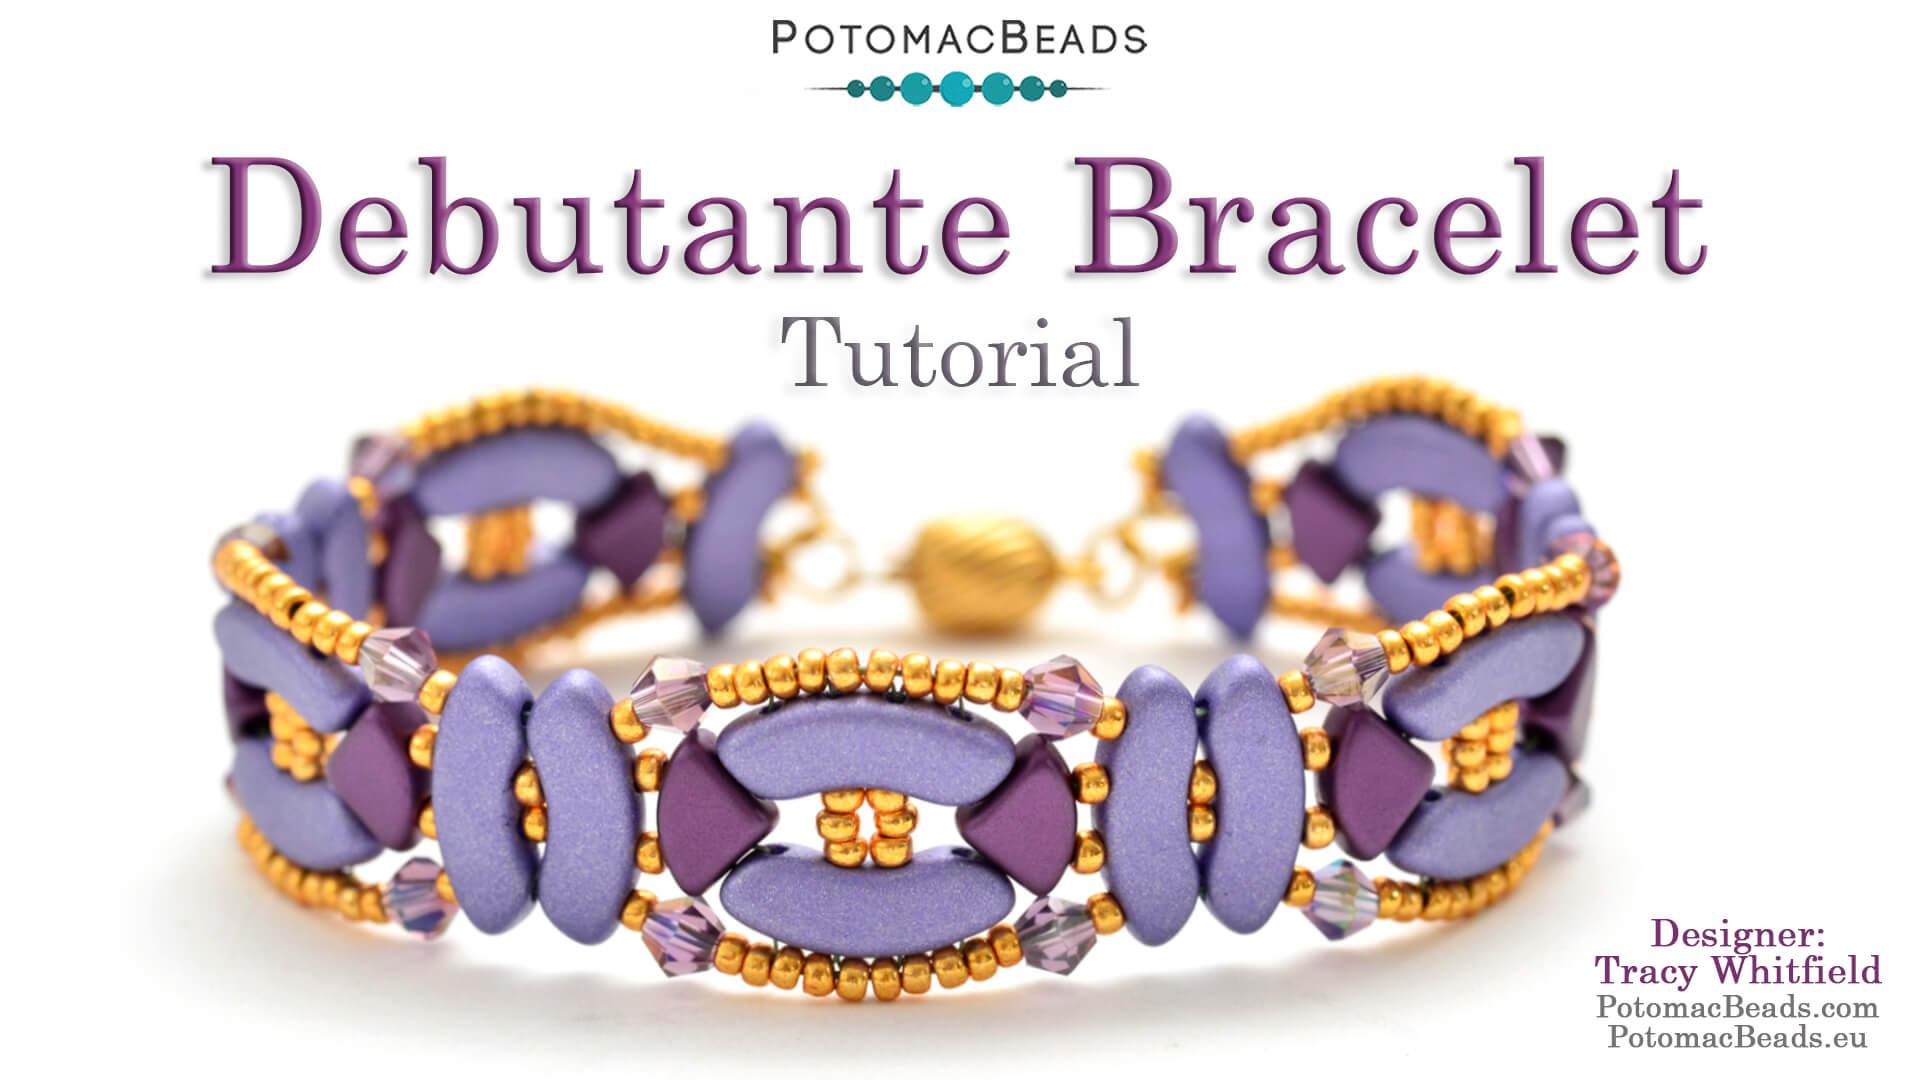 How to Bead / Videos Sorted by Beads / QuadBow & PieDuo Bead Videos / Debutante Bracelet Tutorial